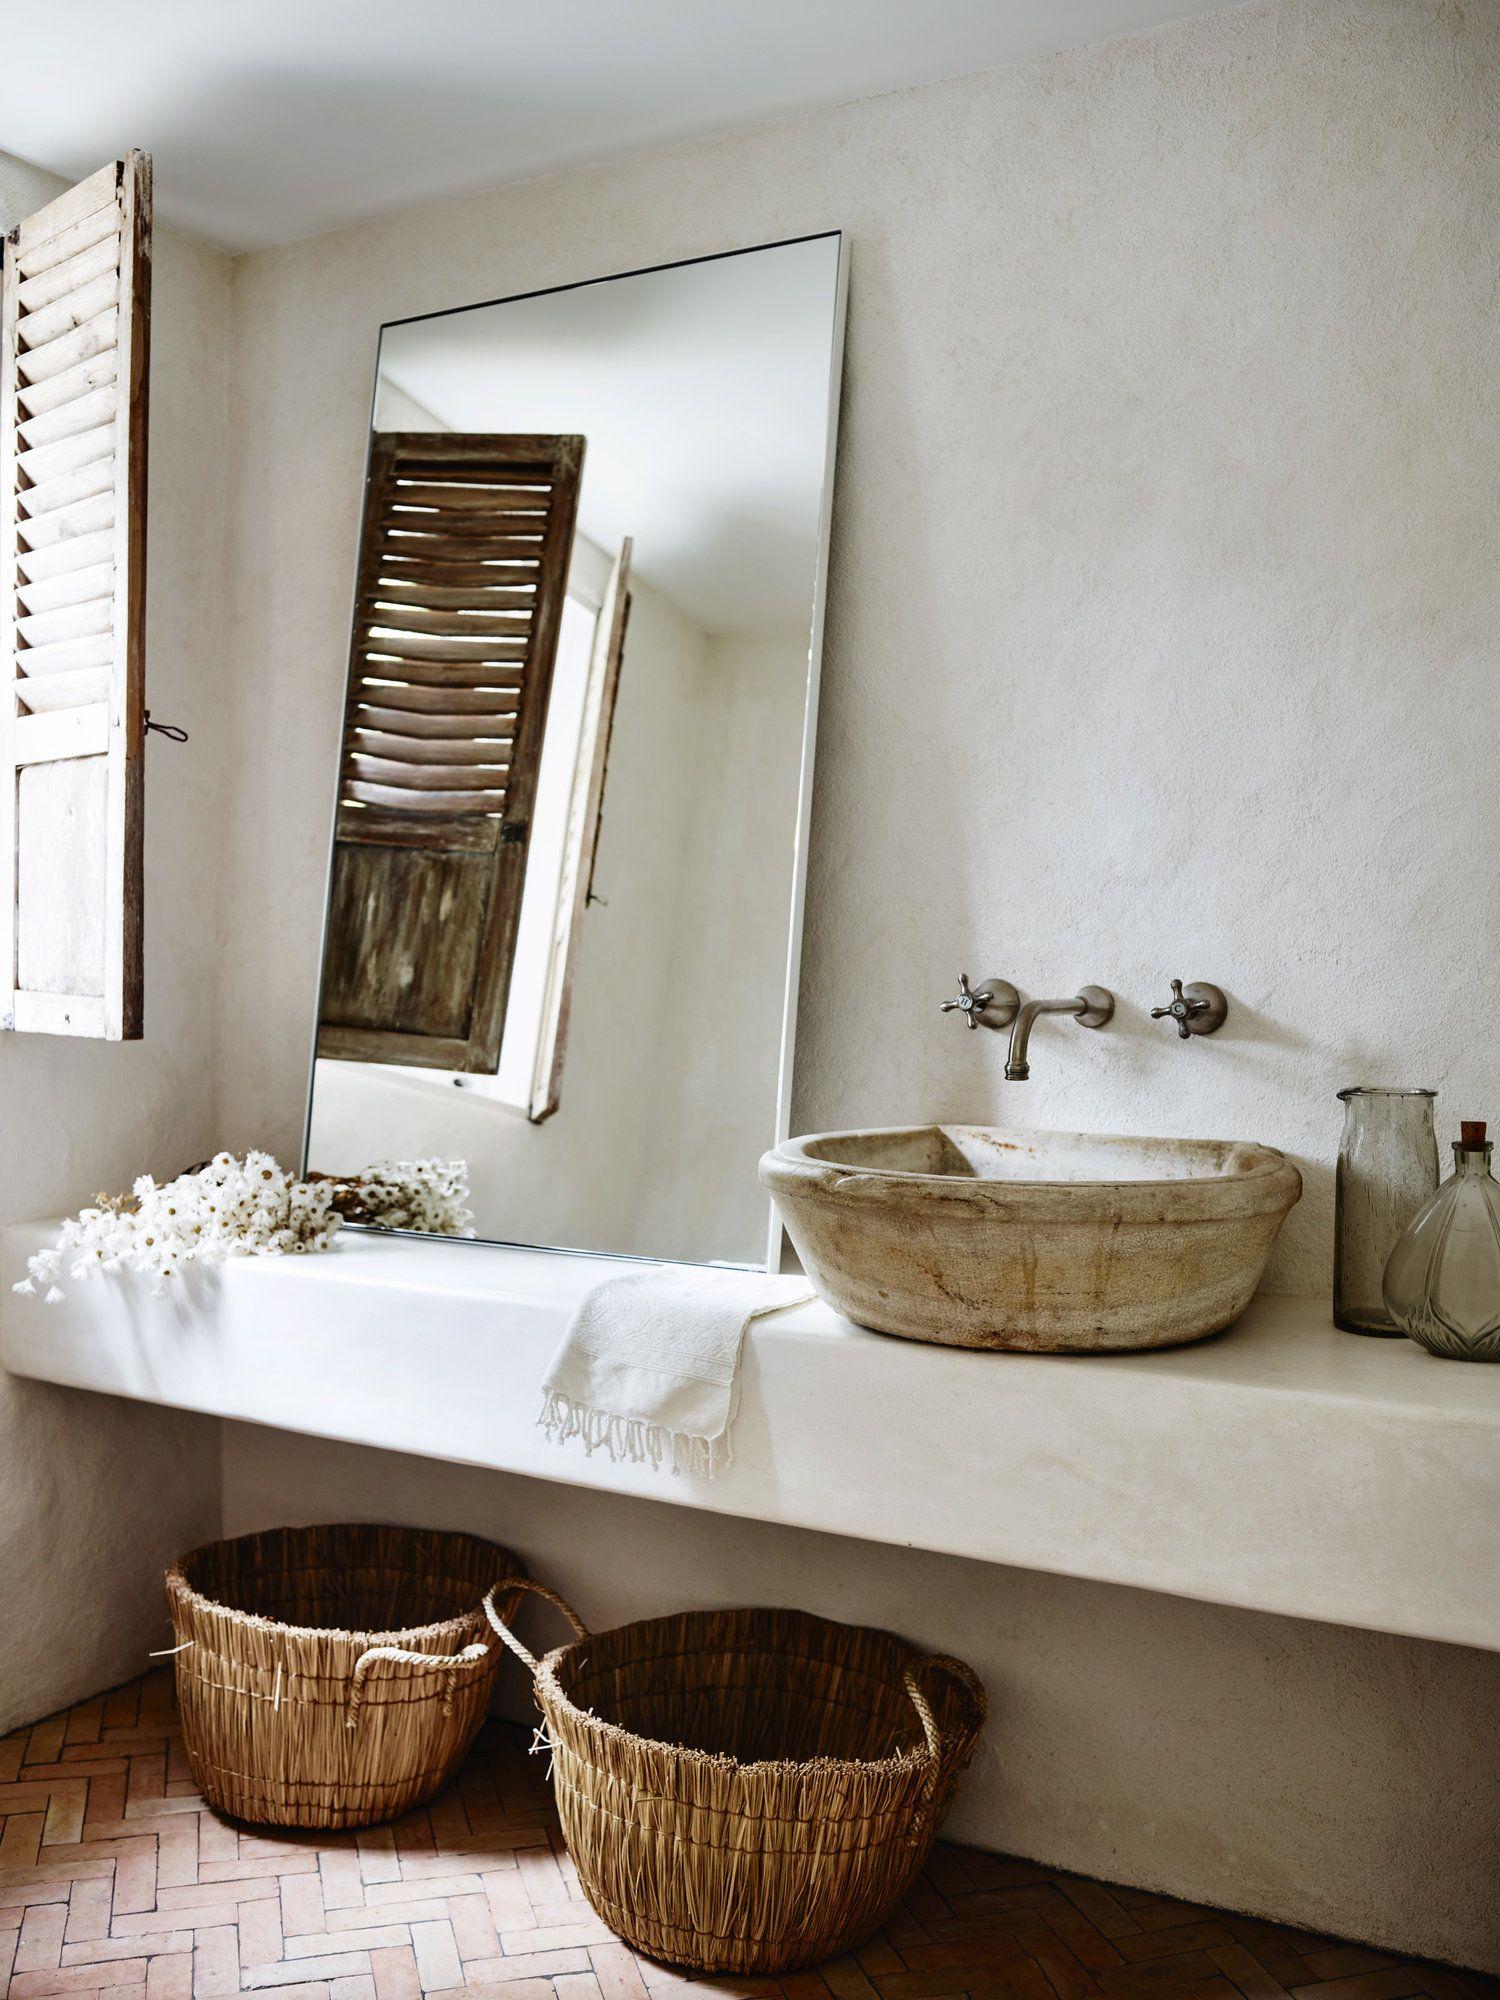 l bathroom with basket storage small baskets design